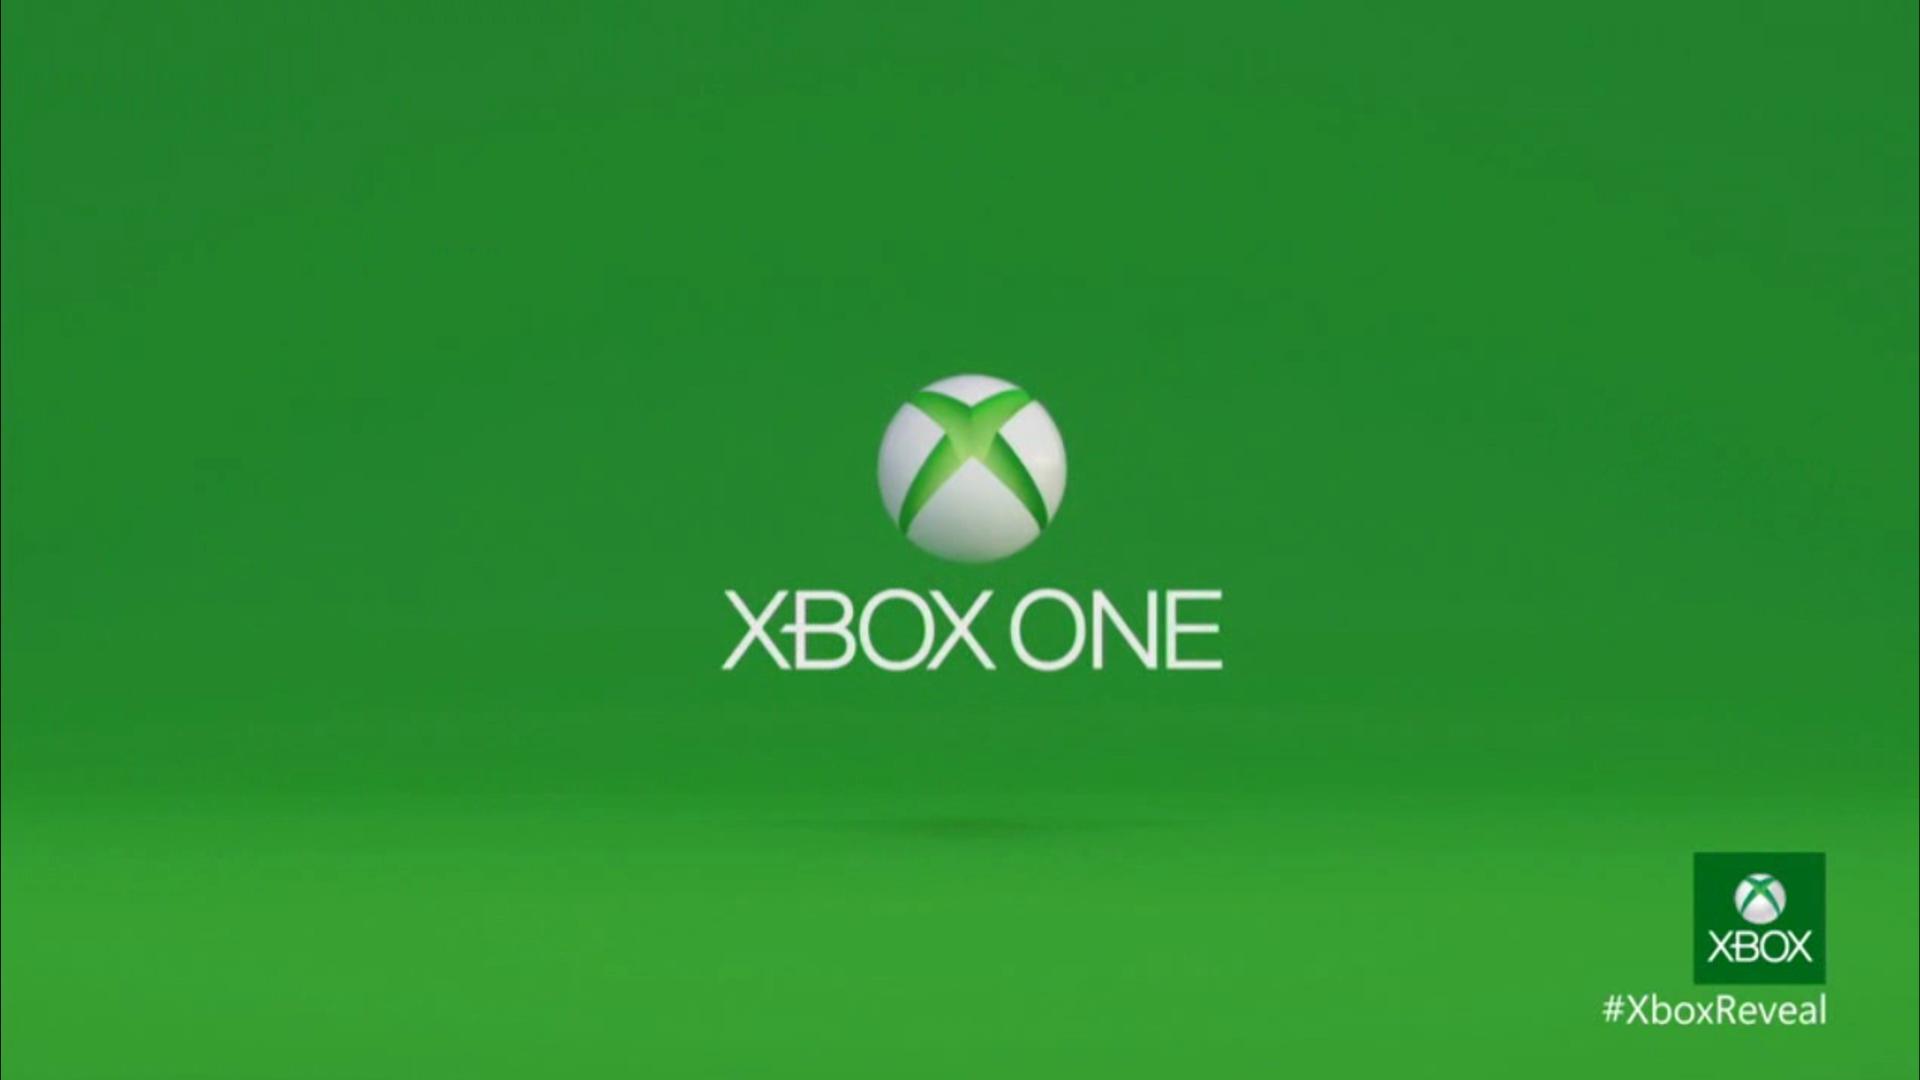 xbox one logo pngXbox One Logo Event Screens Screenshots FPS General 1920x1080